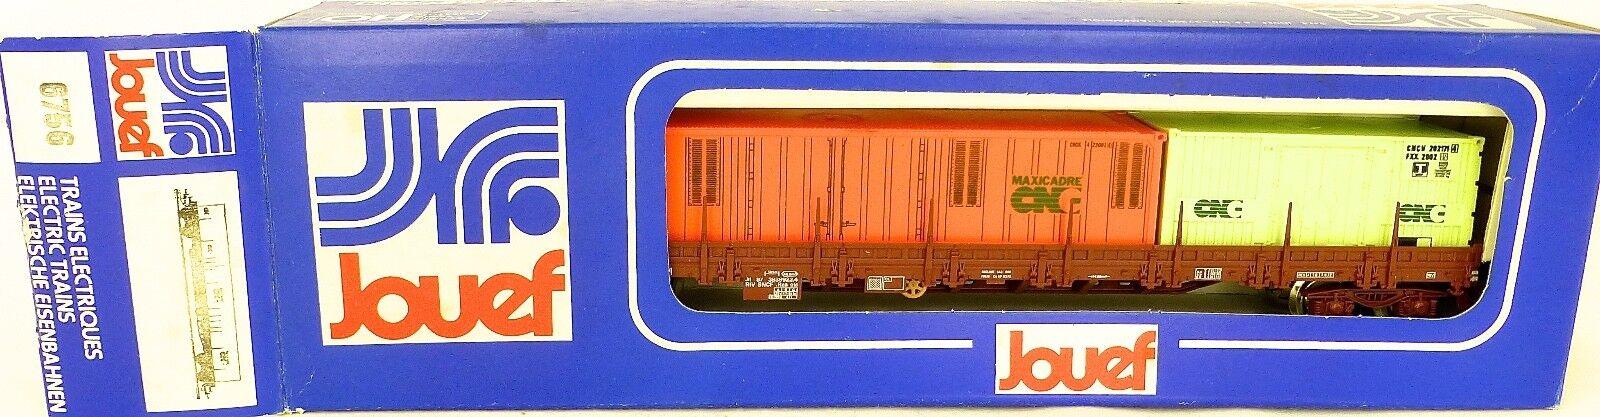 CNC Maxicadre Vagone per Container Jouef 6756 H0 Conf. Orig. 1 87 Å